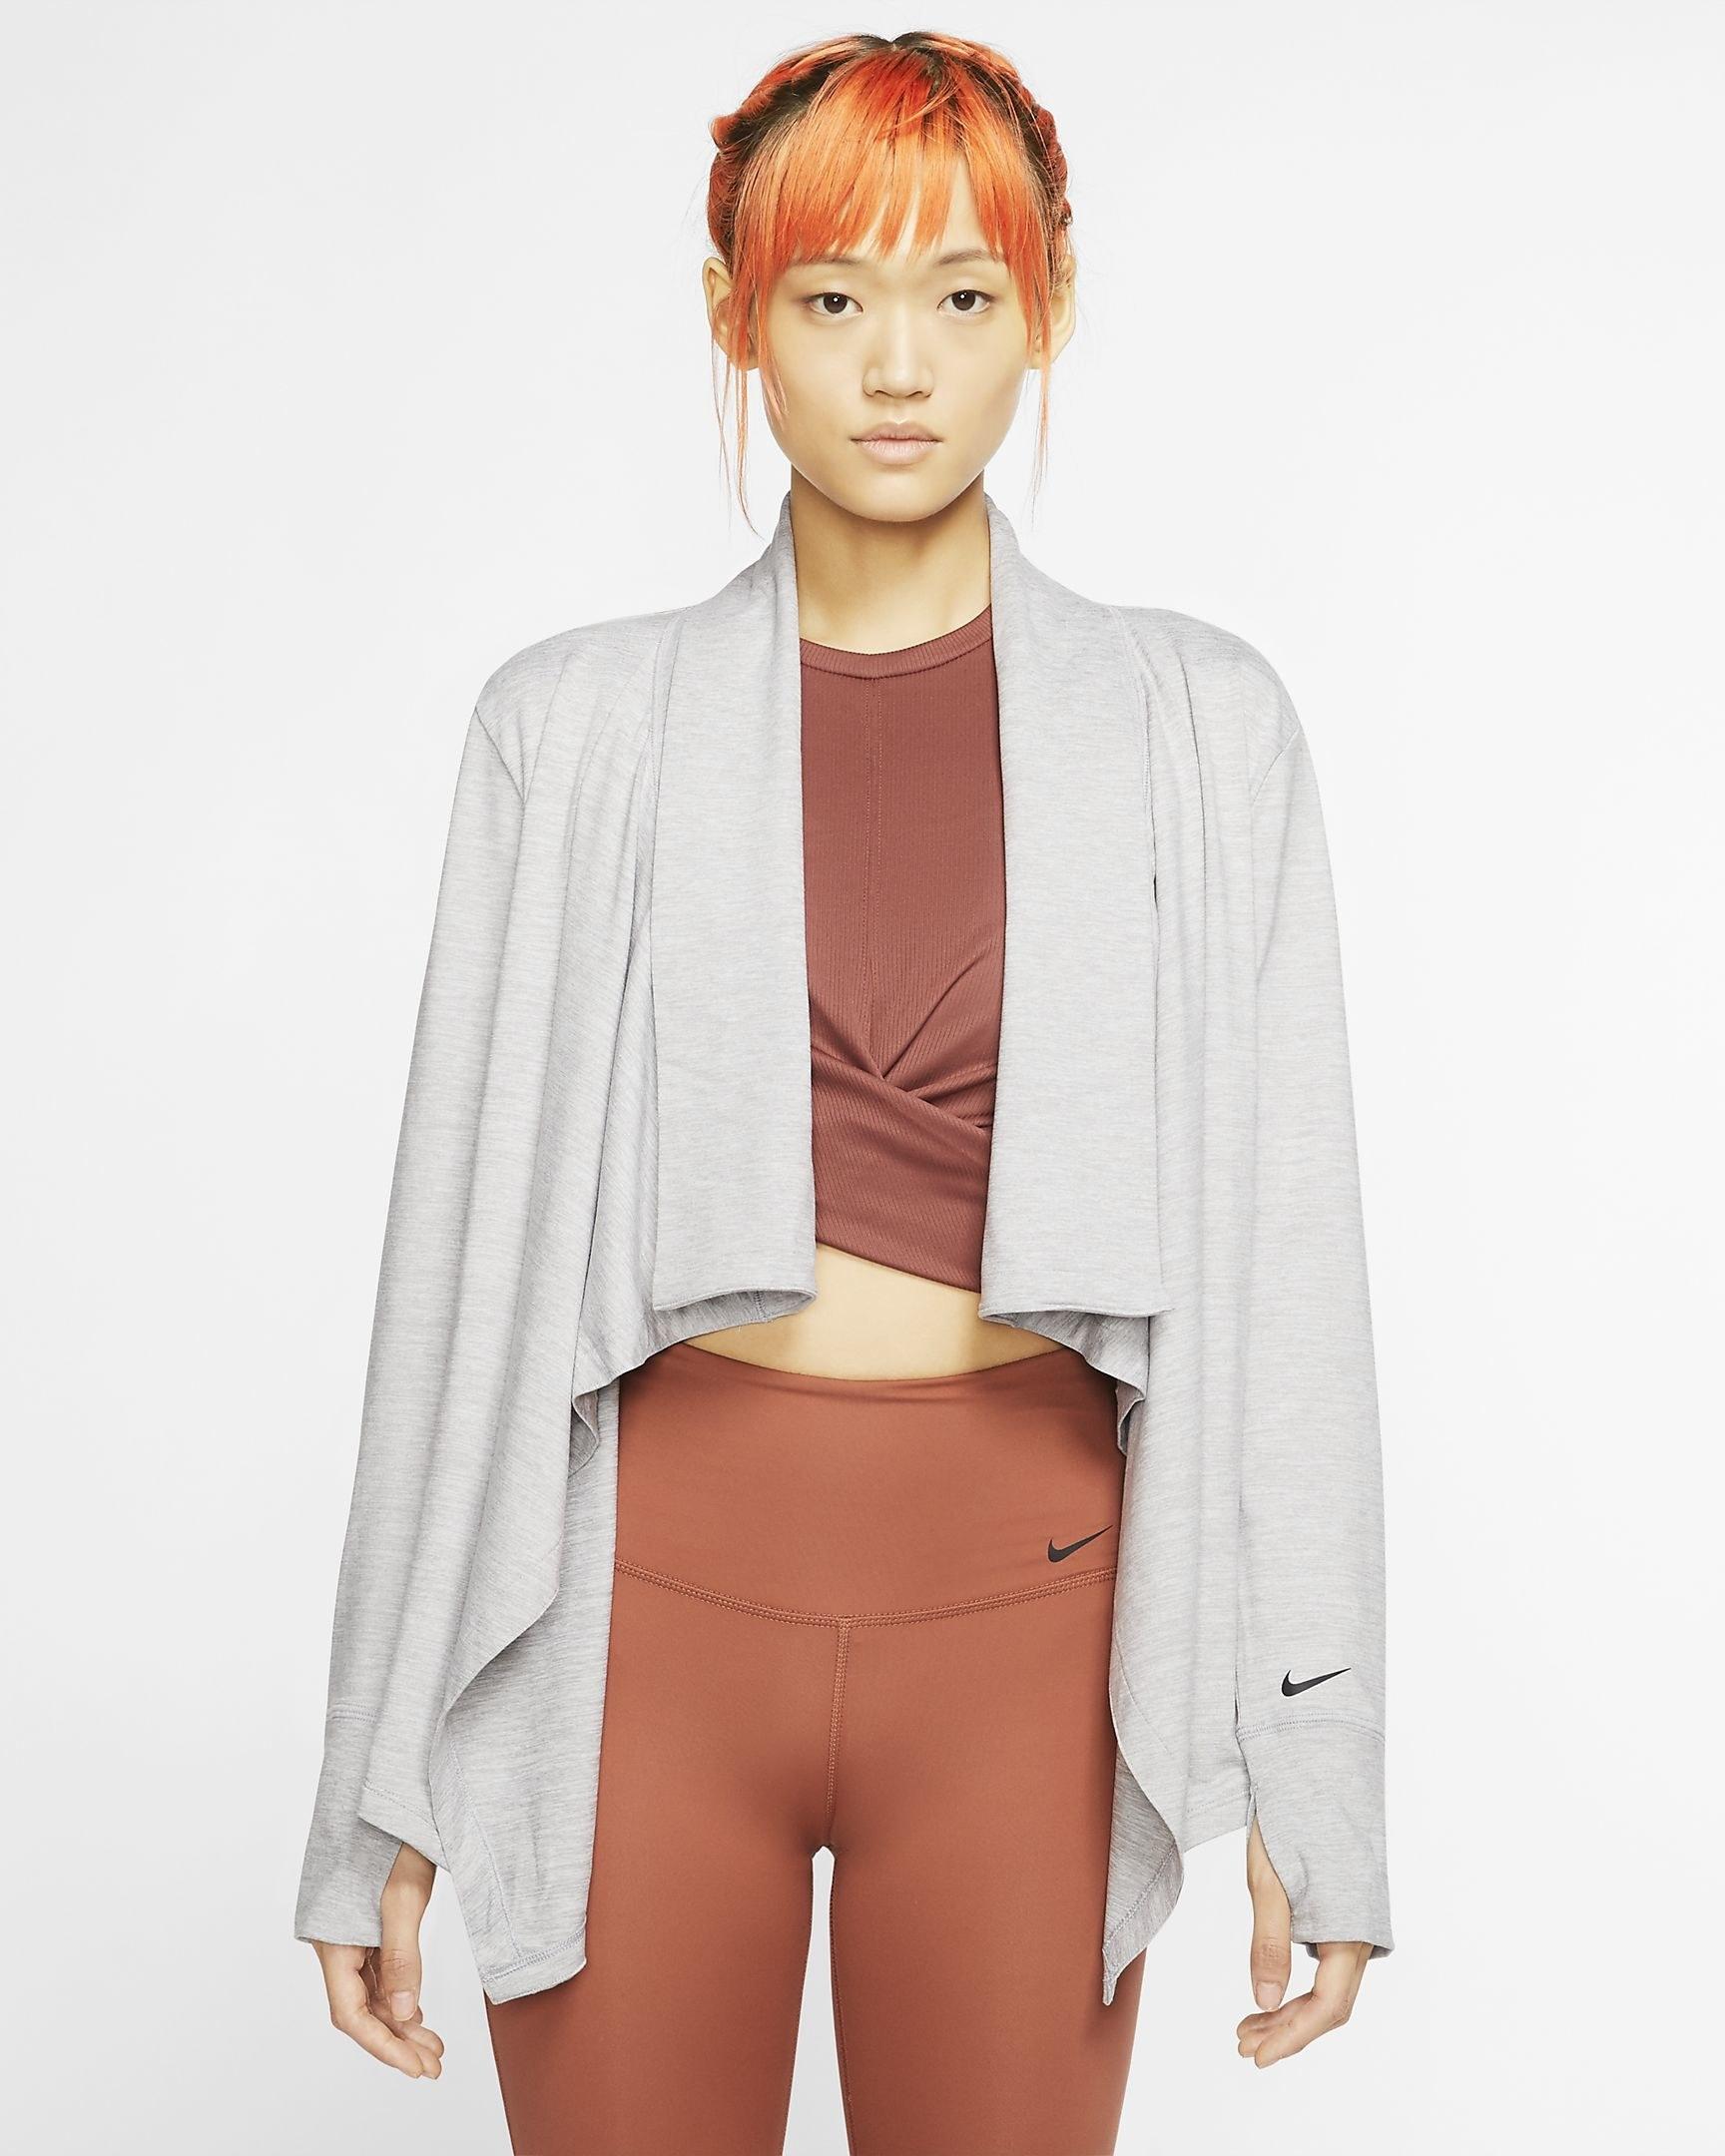 Model in the drape-front open top in grey